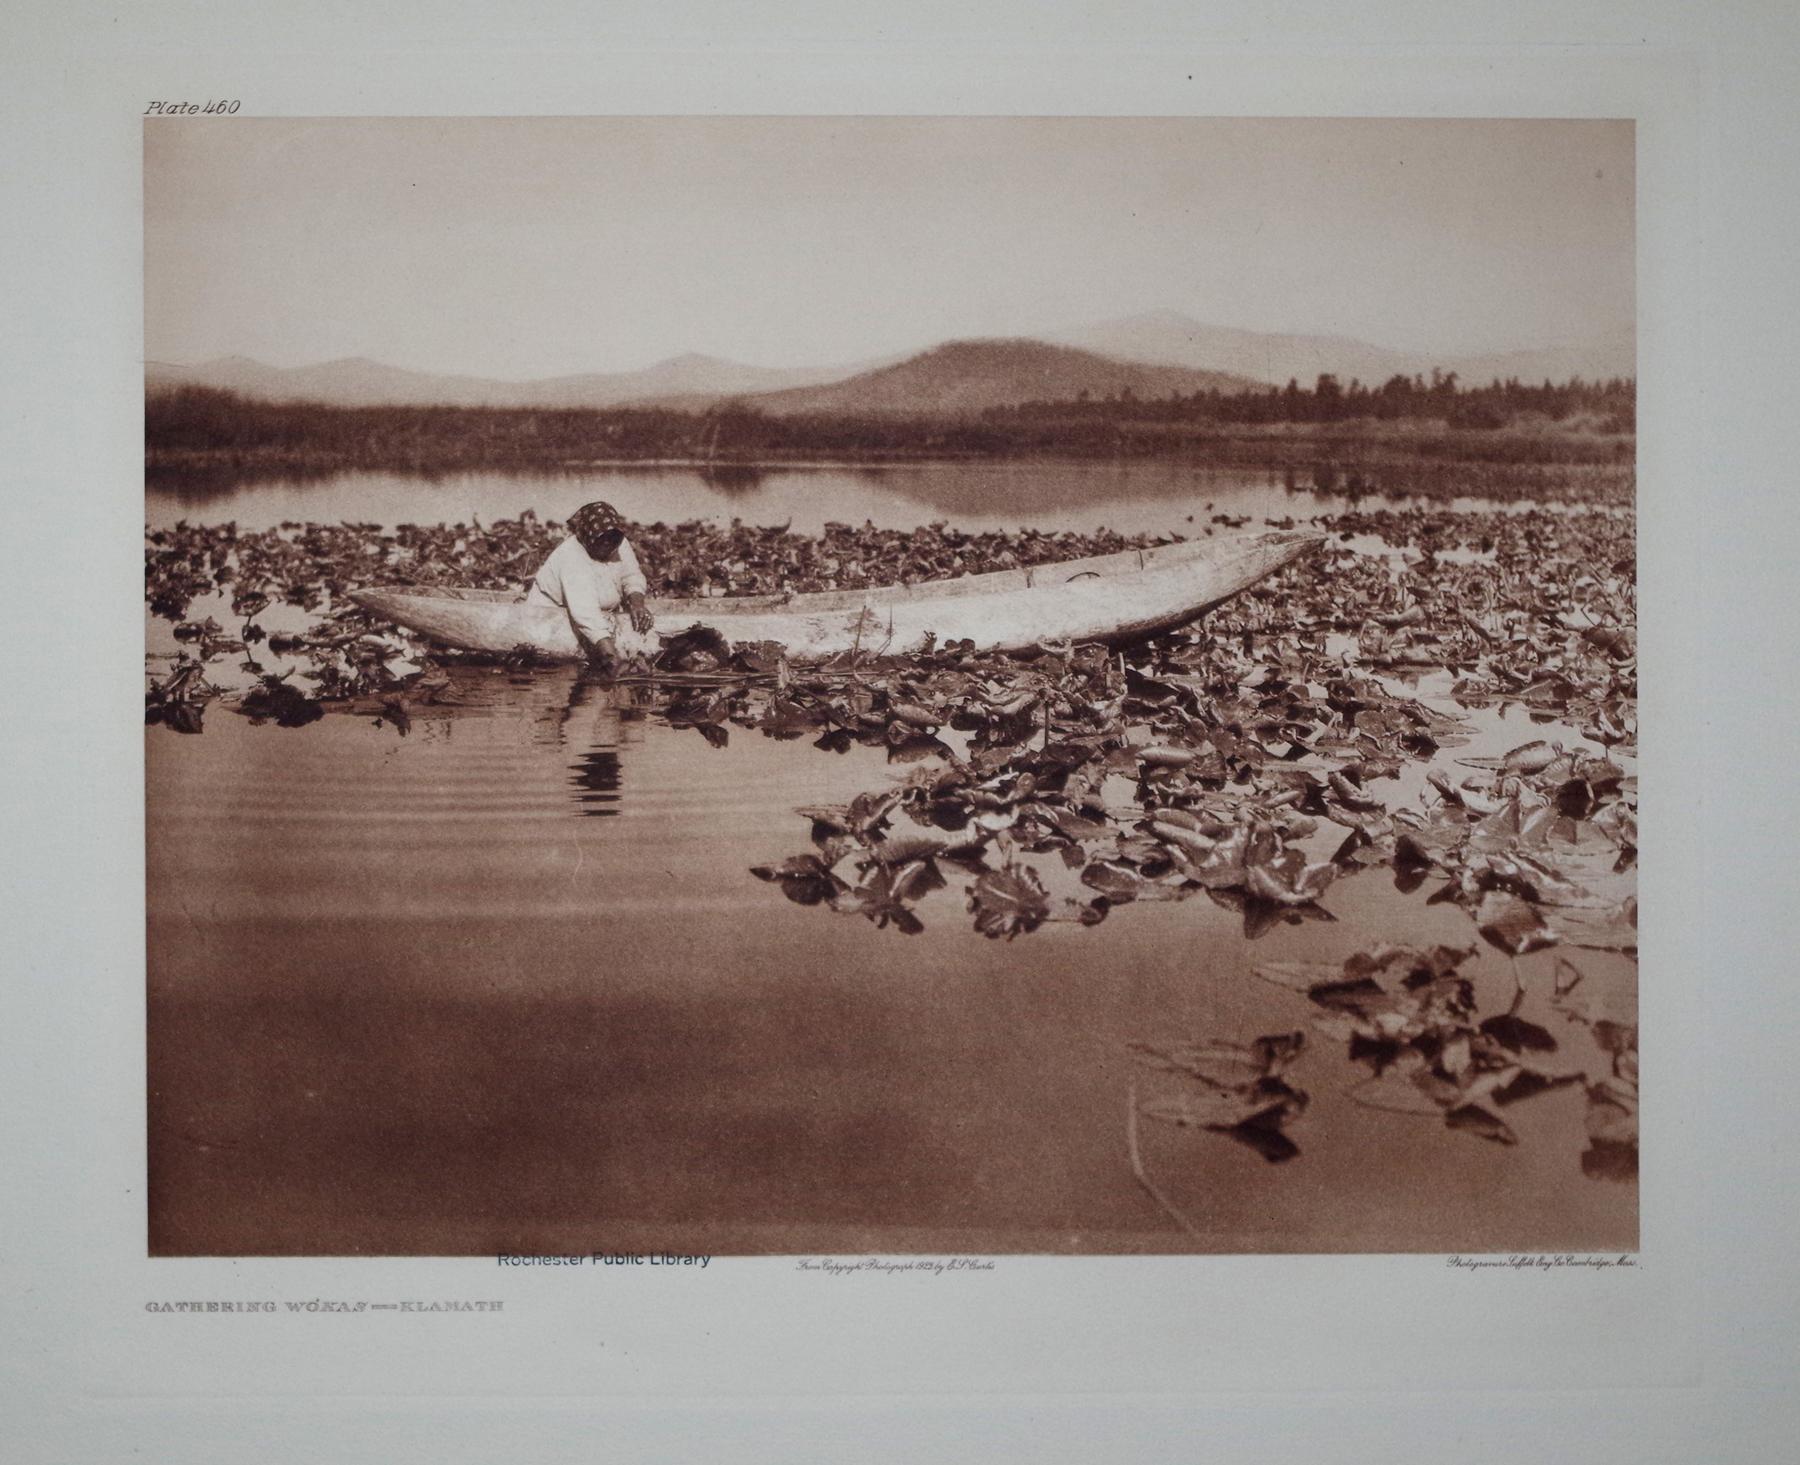 Gathering Wokas - Klamath, Plate 460 from The North American Indian. Portfolio XIII: Edward S. ...